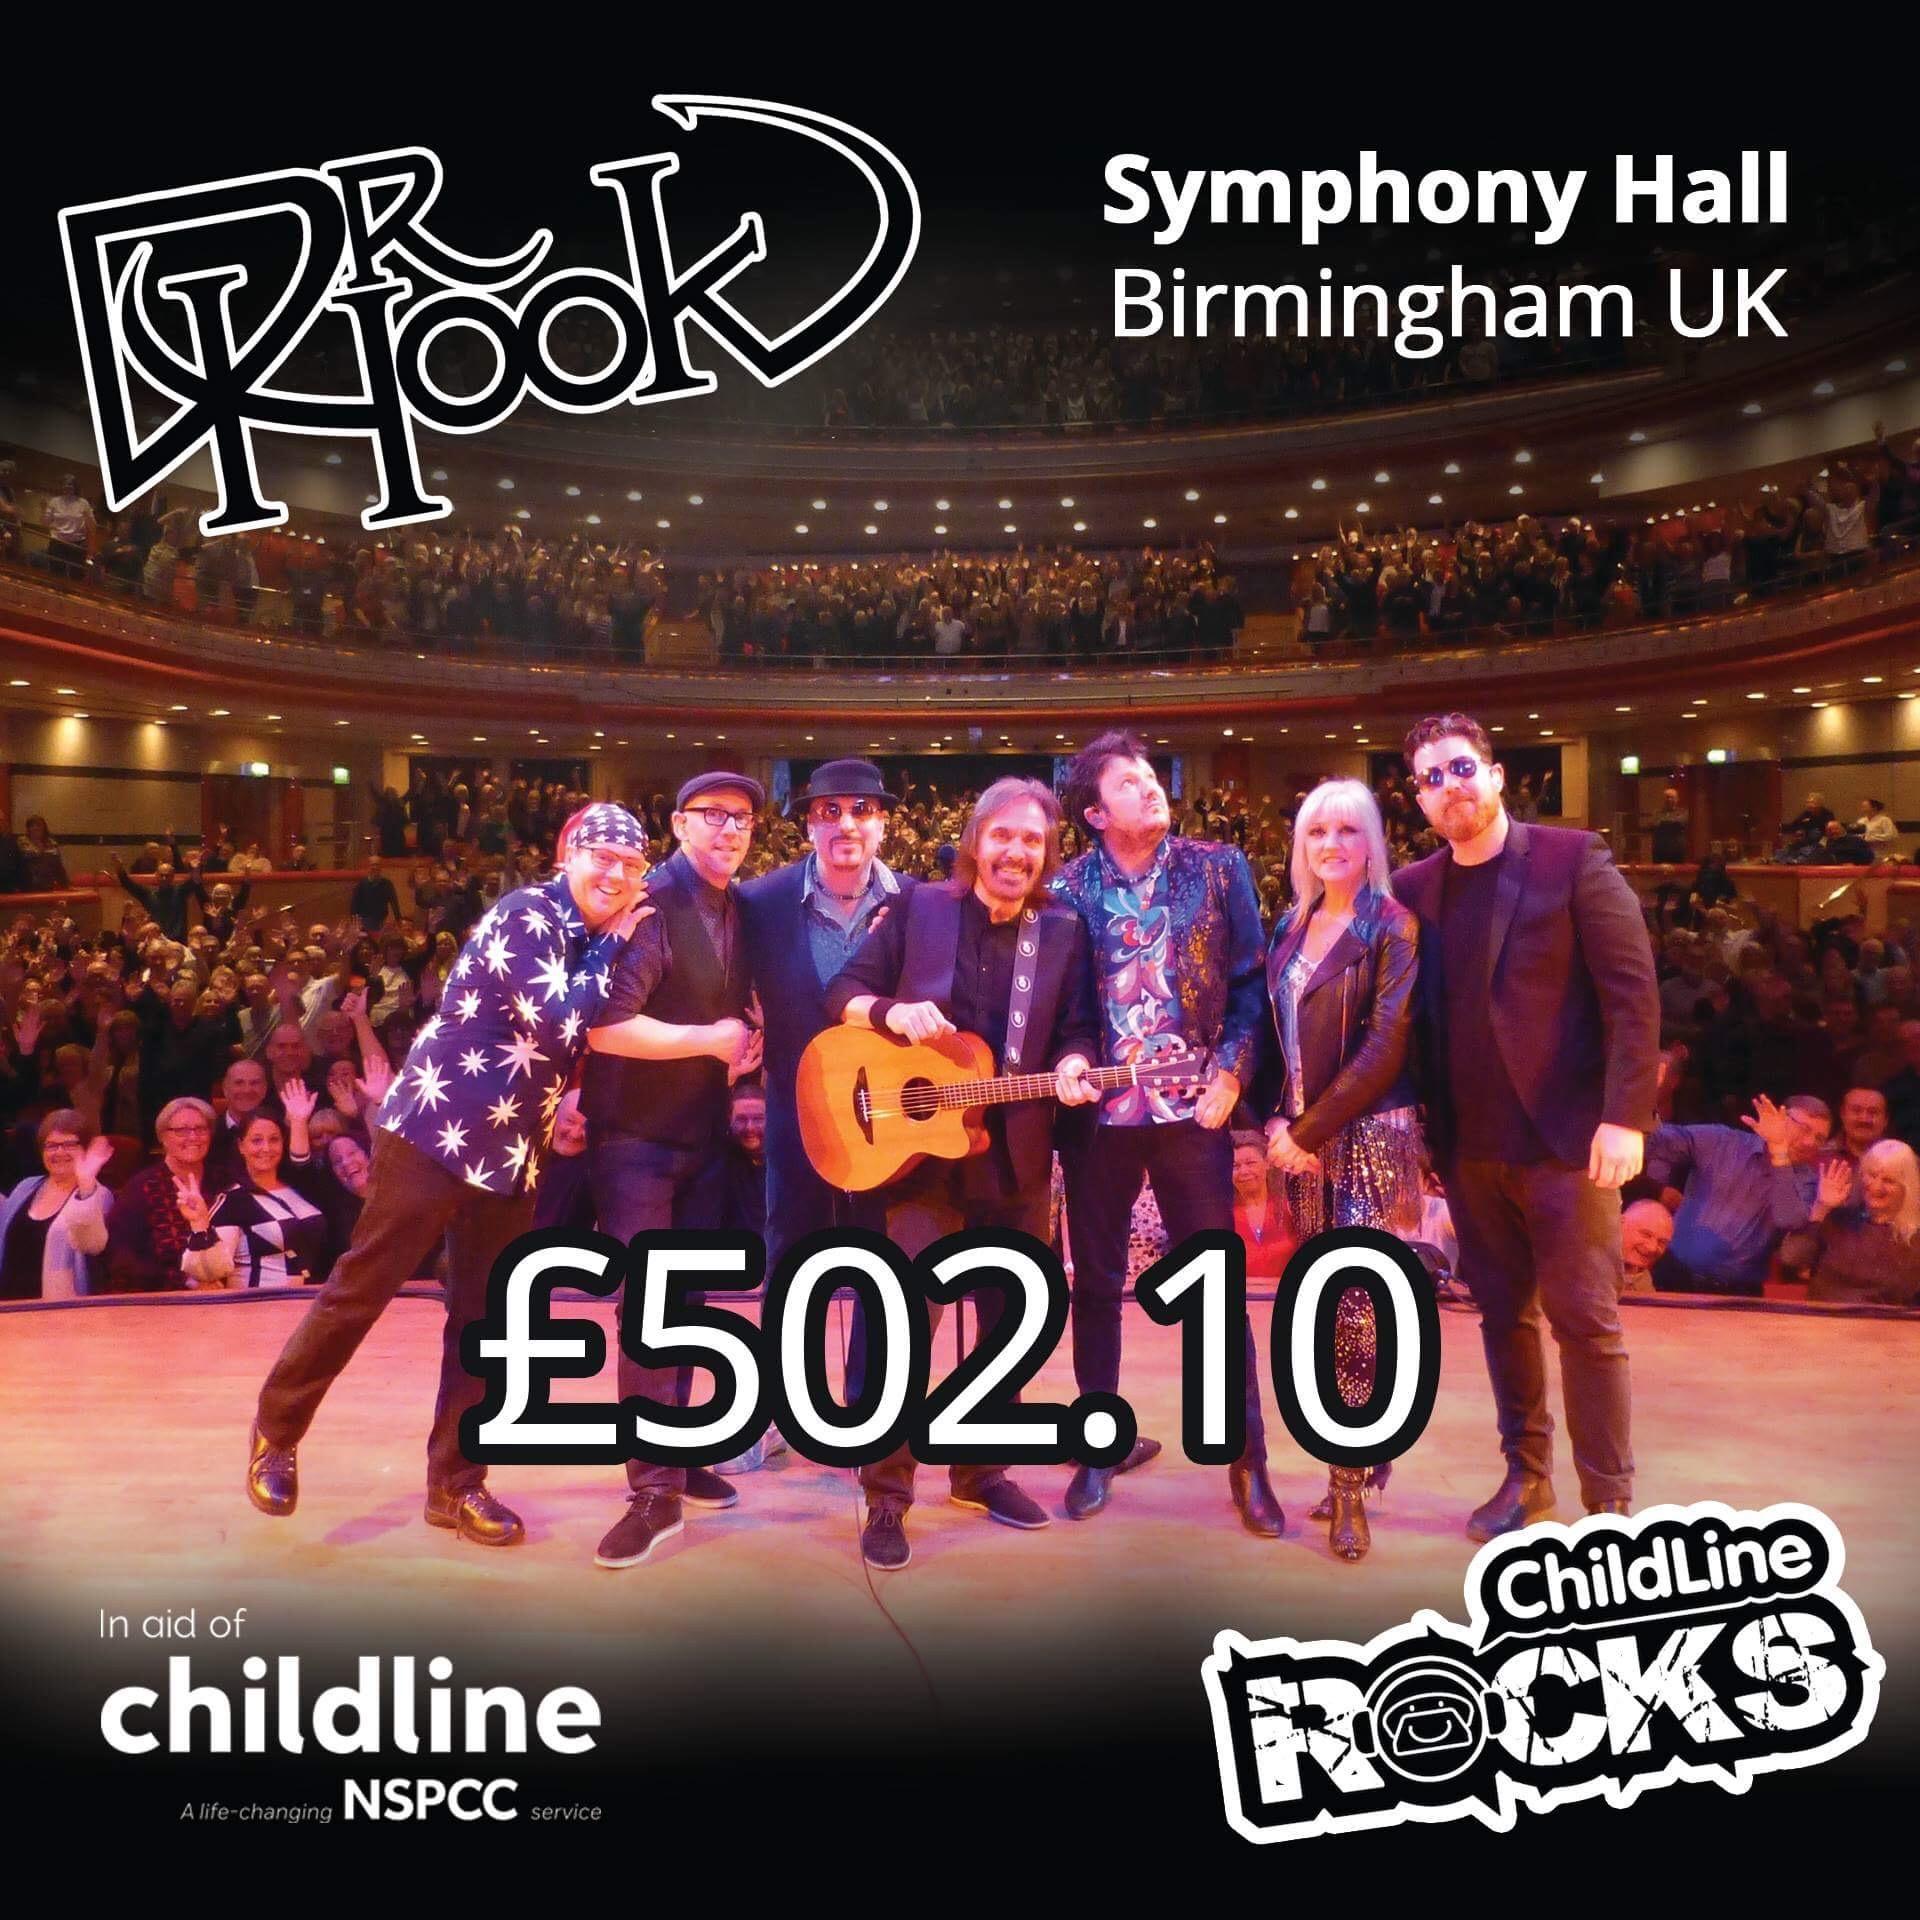 Dr Hook   UK & IE Tour   2017   Fundraising For NSPCC Childline   Birmingham UK